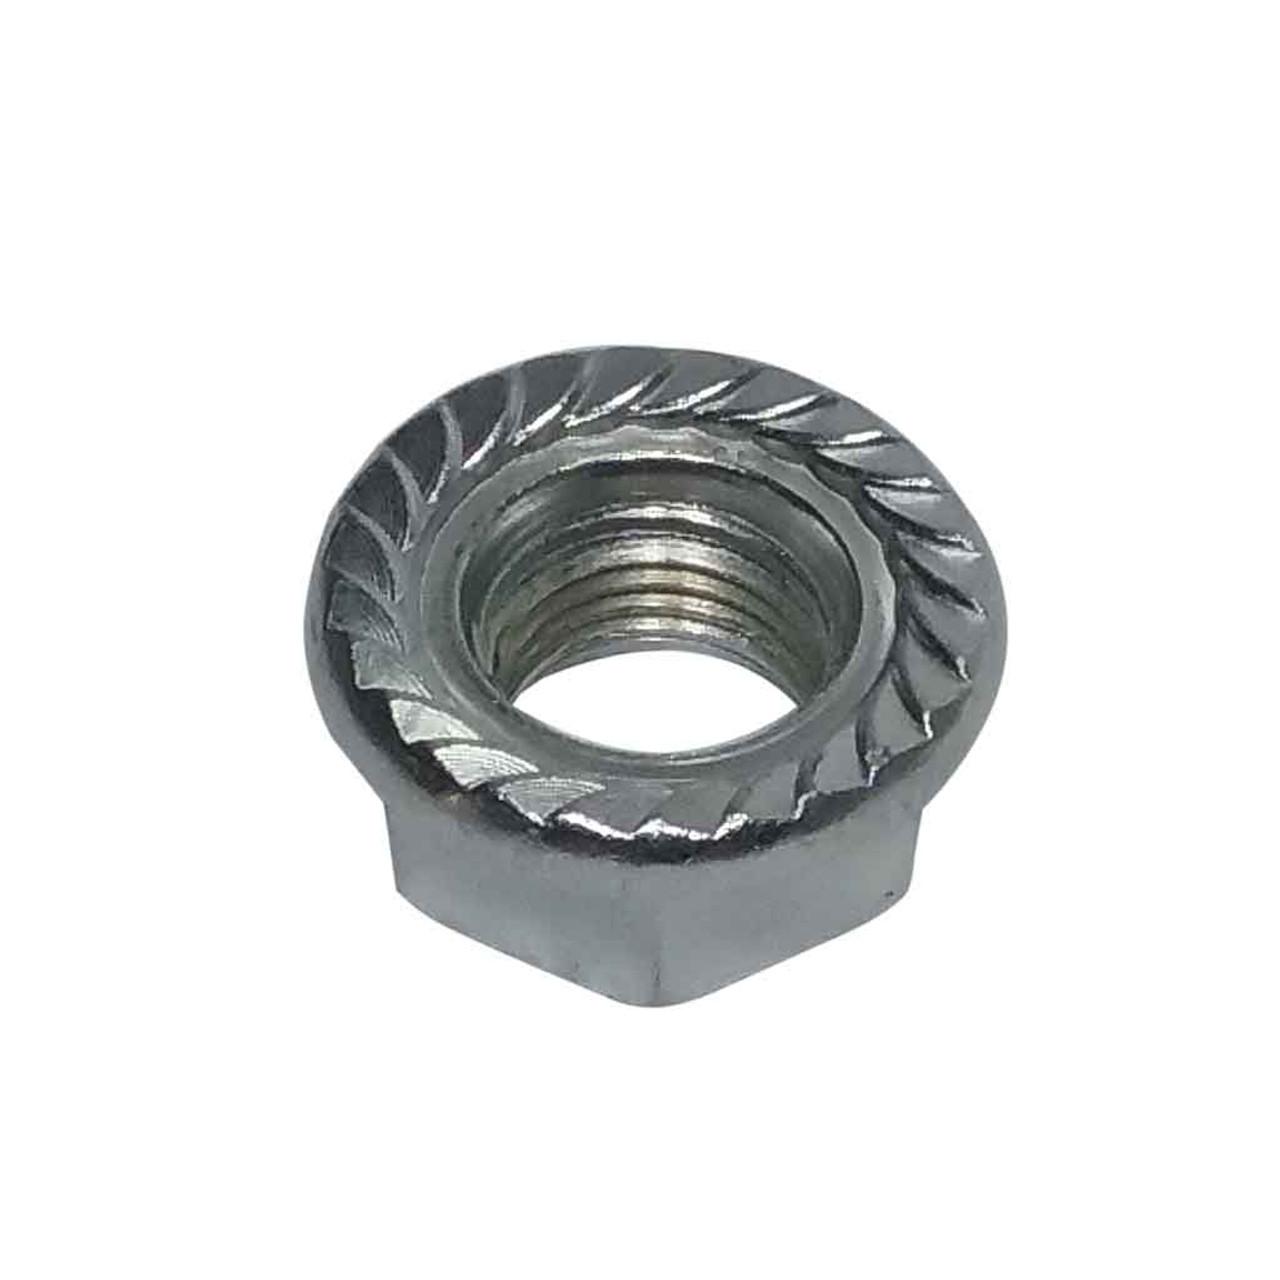 Clone/GX200 Flywheel/Starter Cup Nut